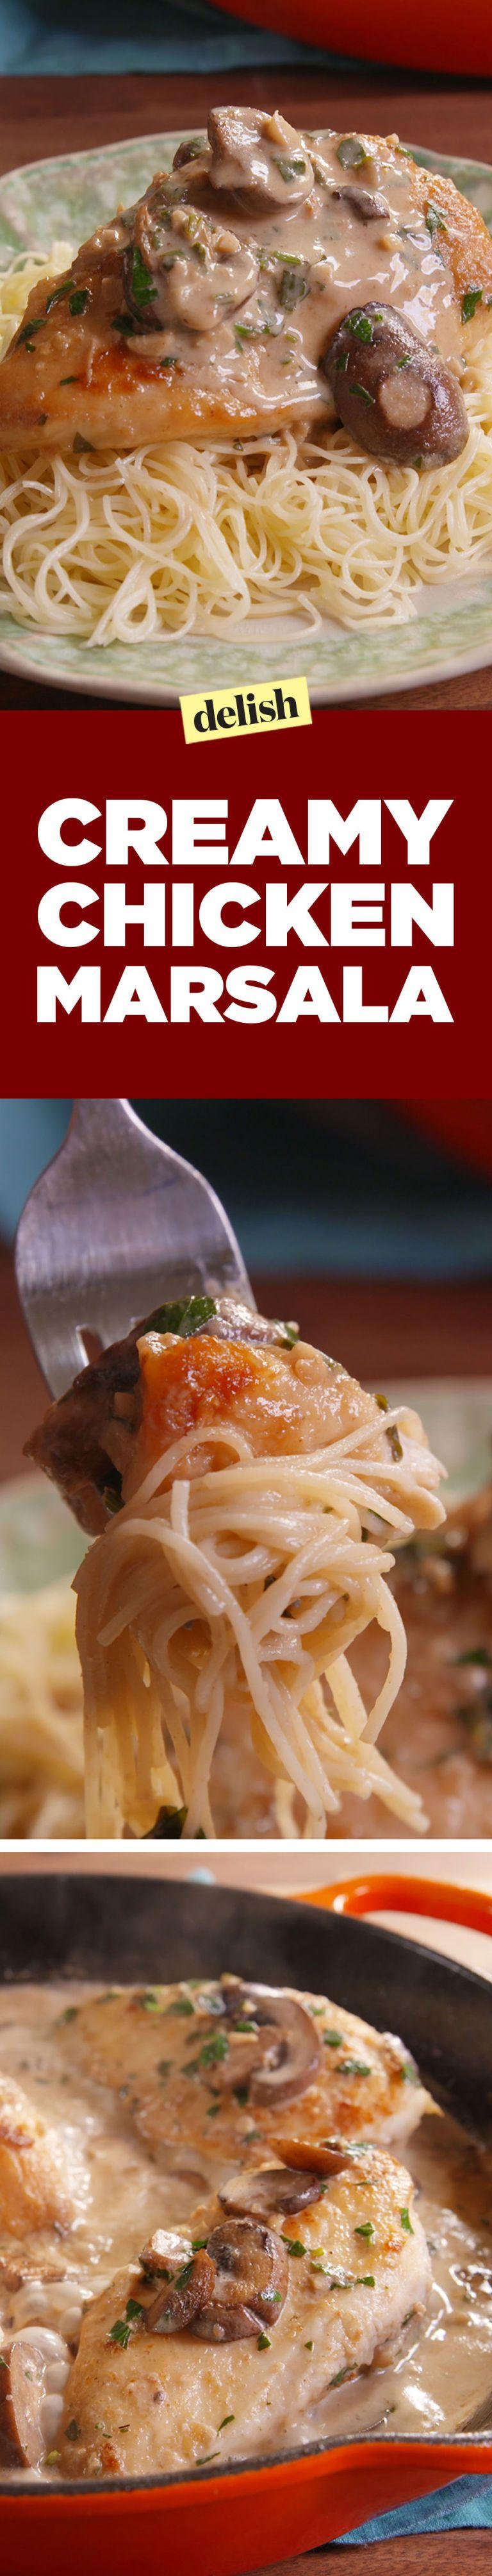 Creamy Chicken Marsala Is A Gift From Italian Gods Recipe Recipes Chicken Marsala Chicken Recipes